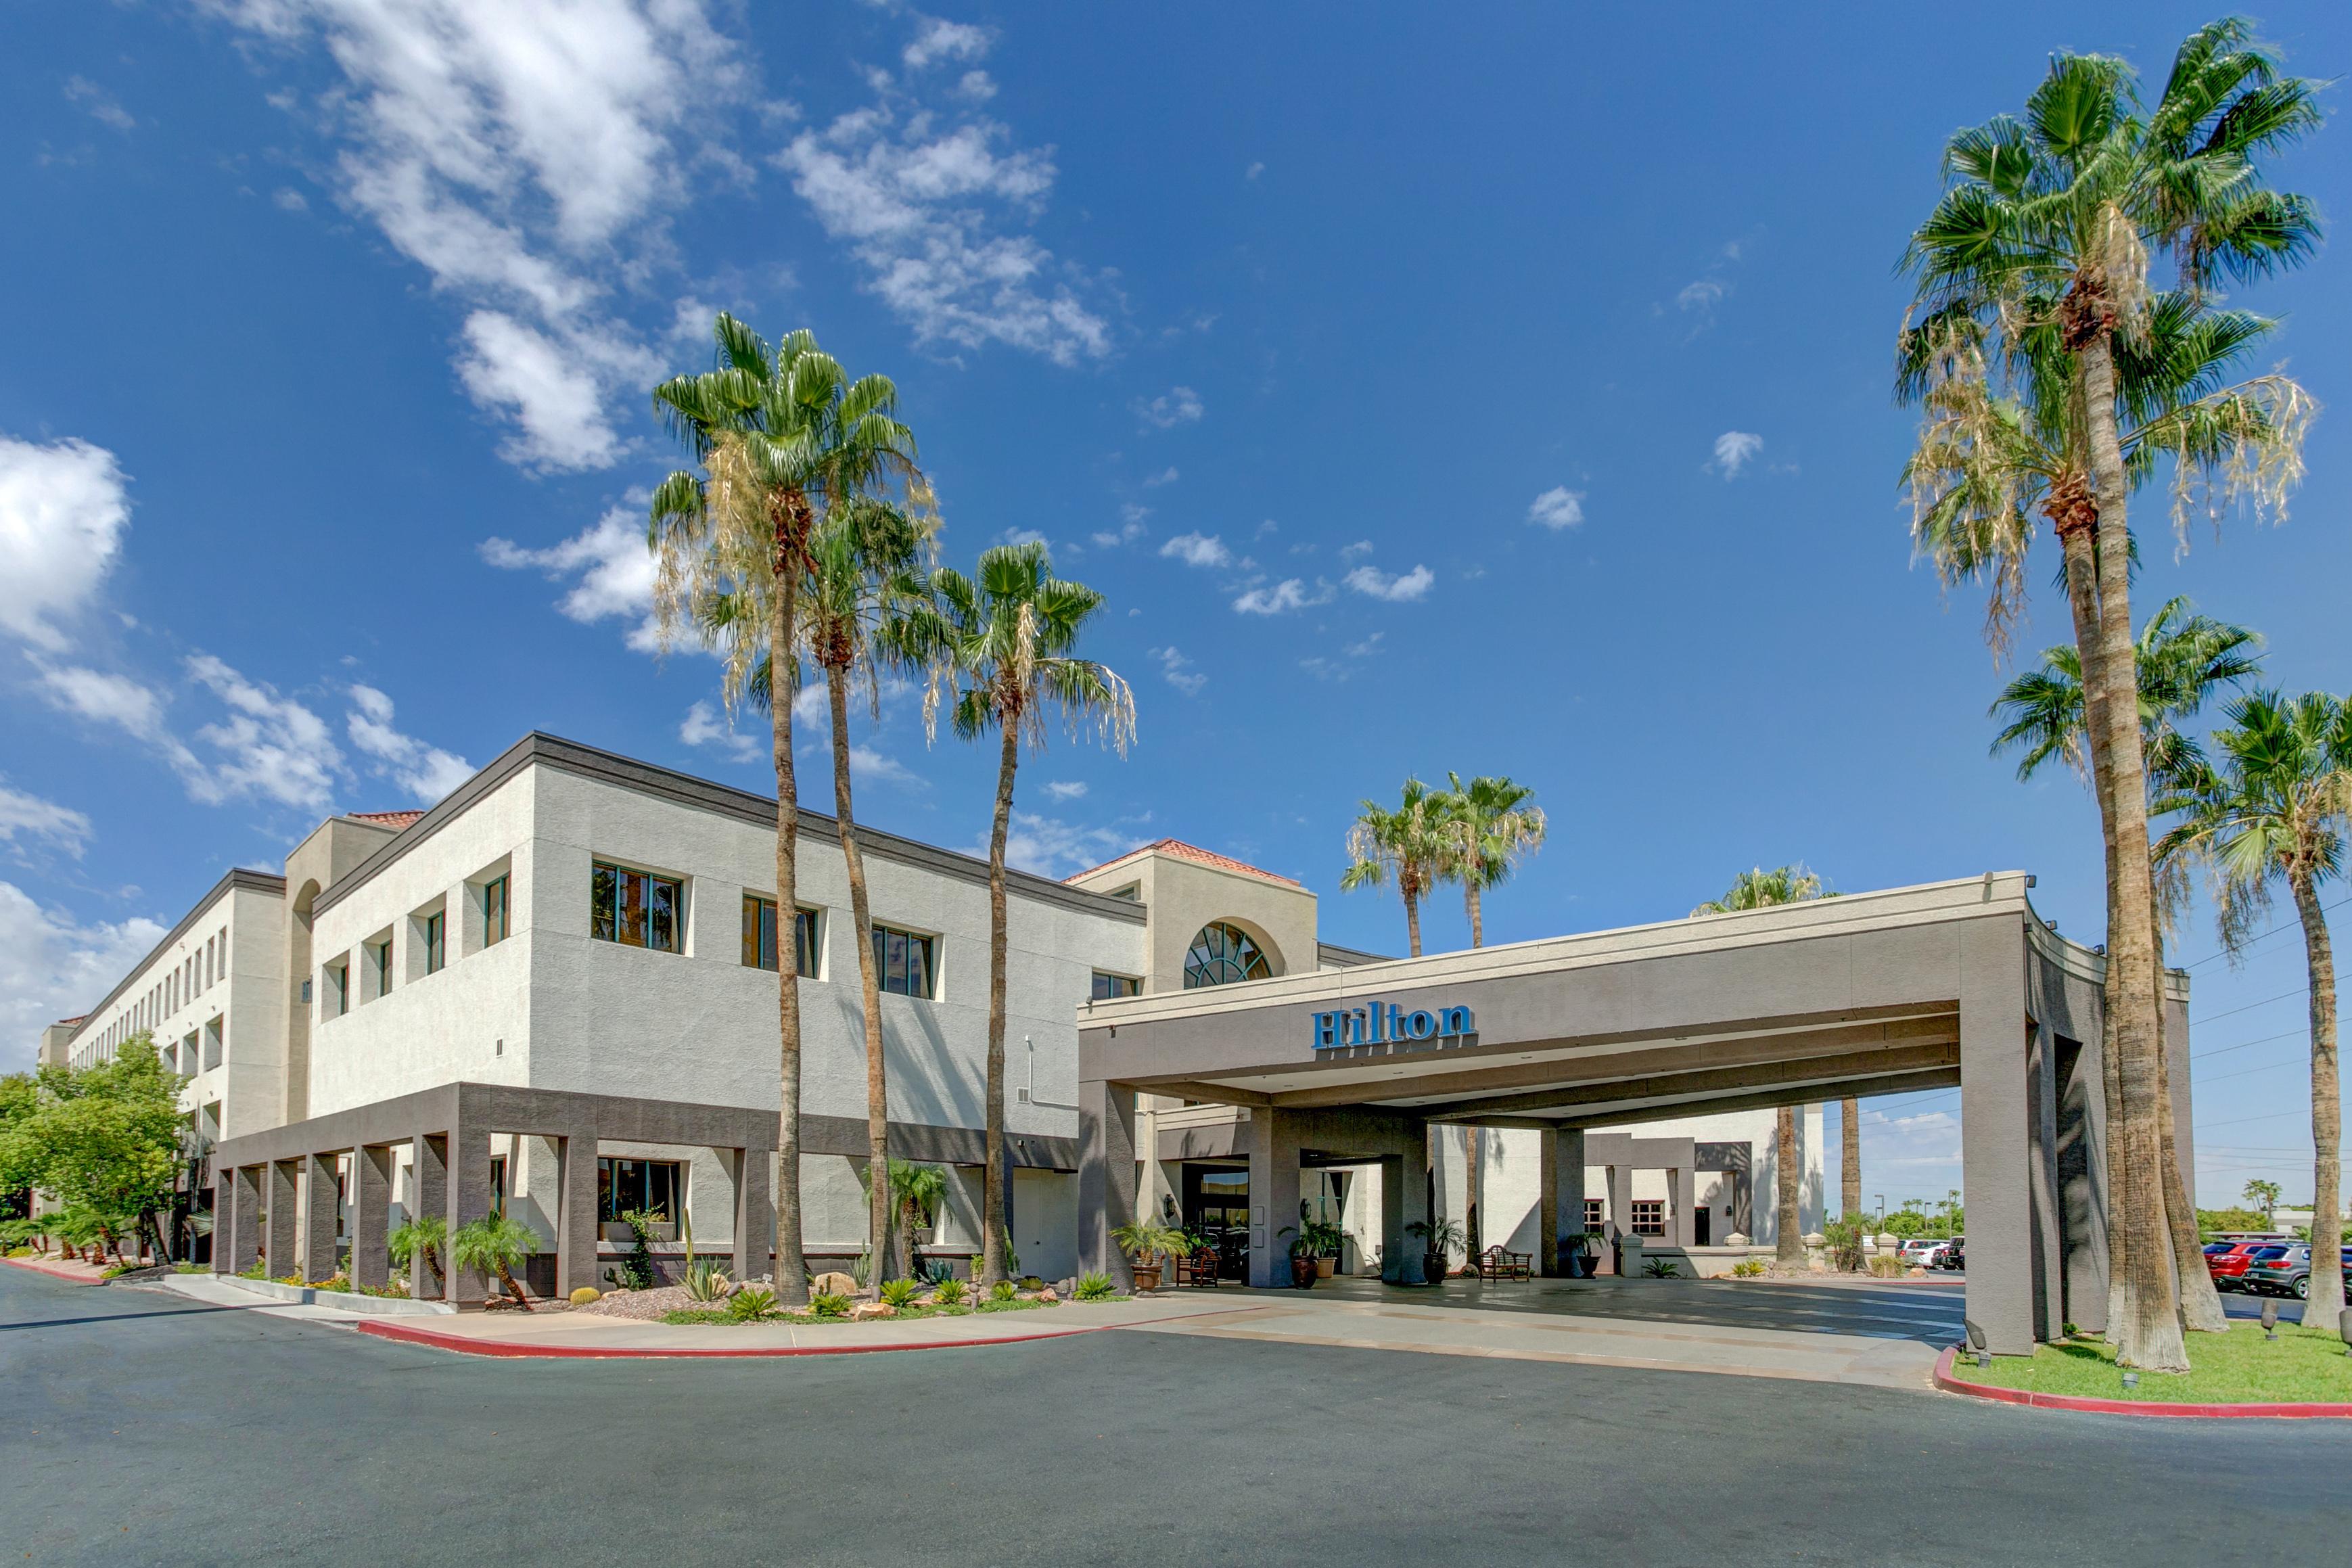 Heavlin Management Company Adds The Hilton Phoenix Airport Hotel To Portfolio